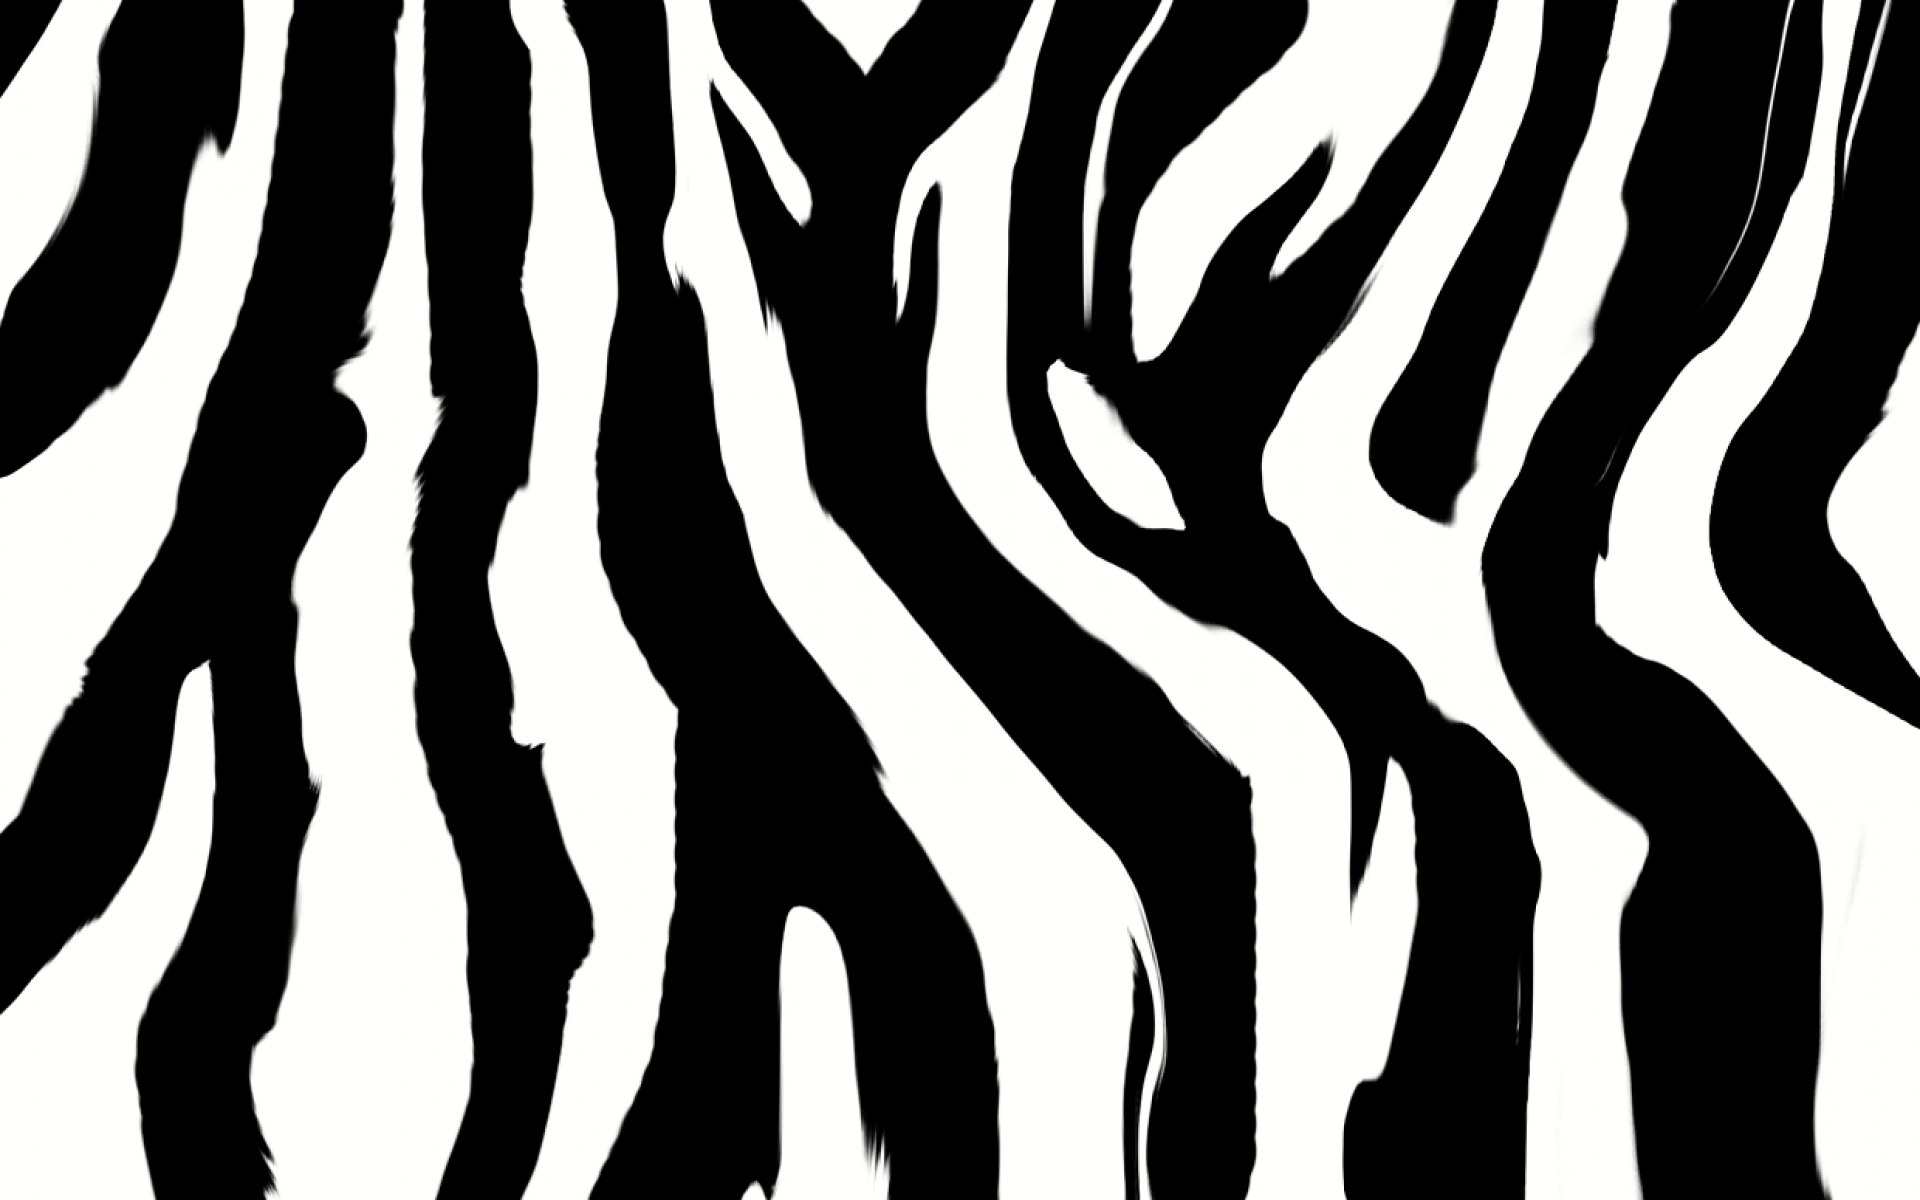 Zebra Backgrounds HD Wallpaper